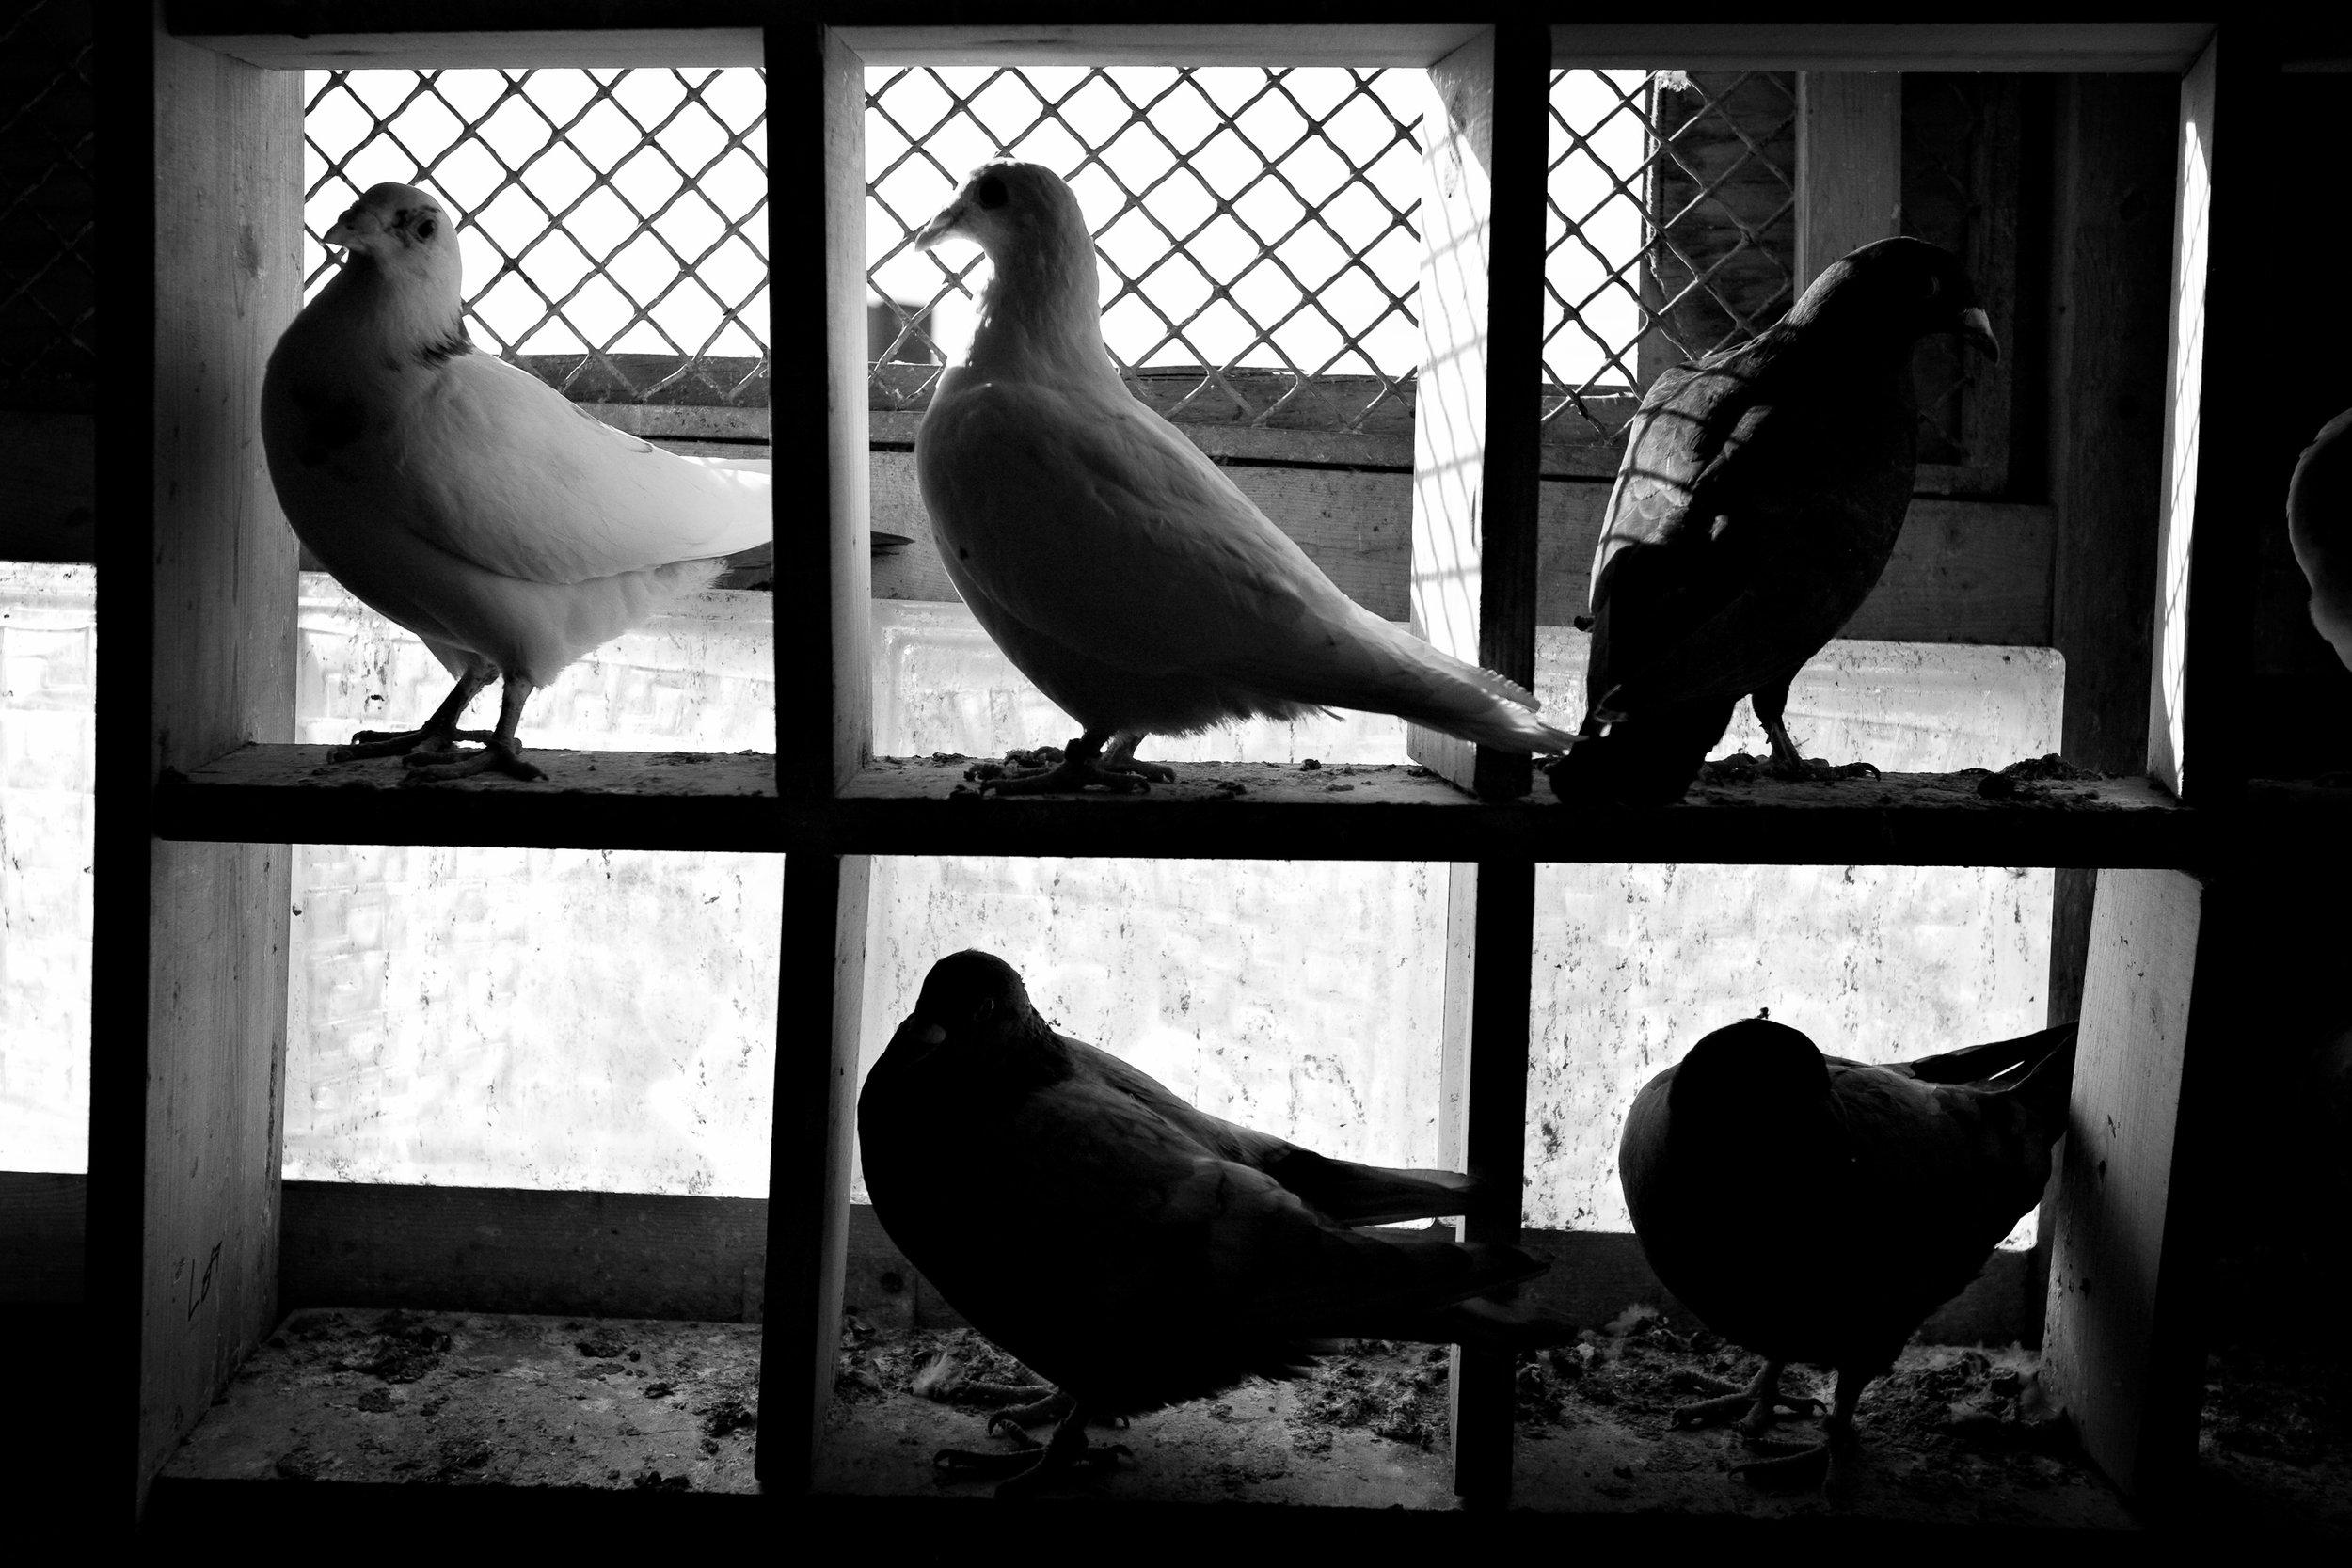 pigeon013.jpg